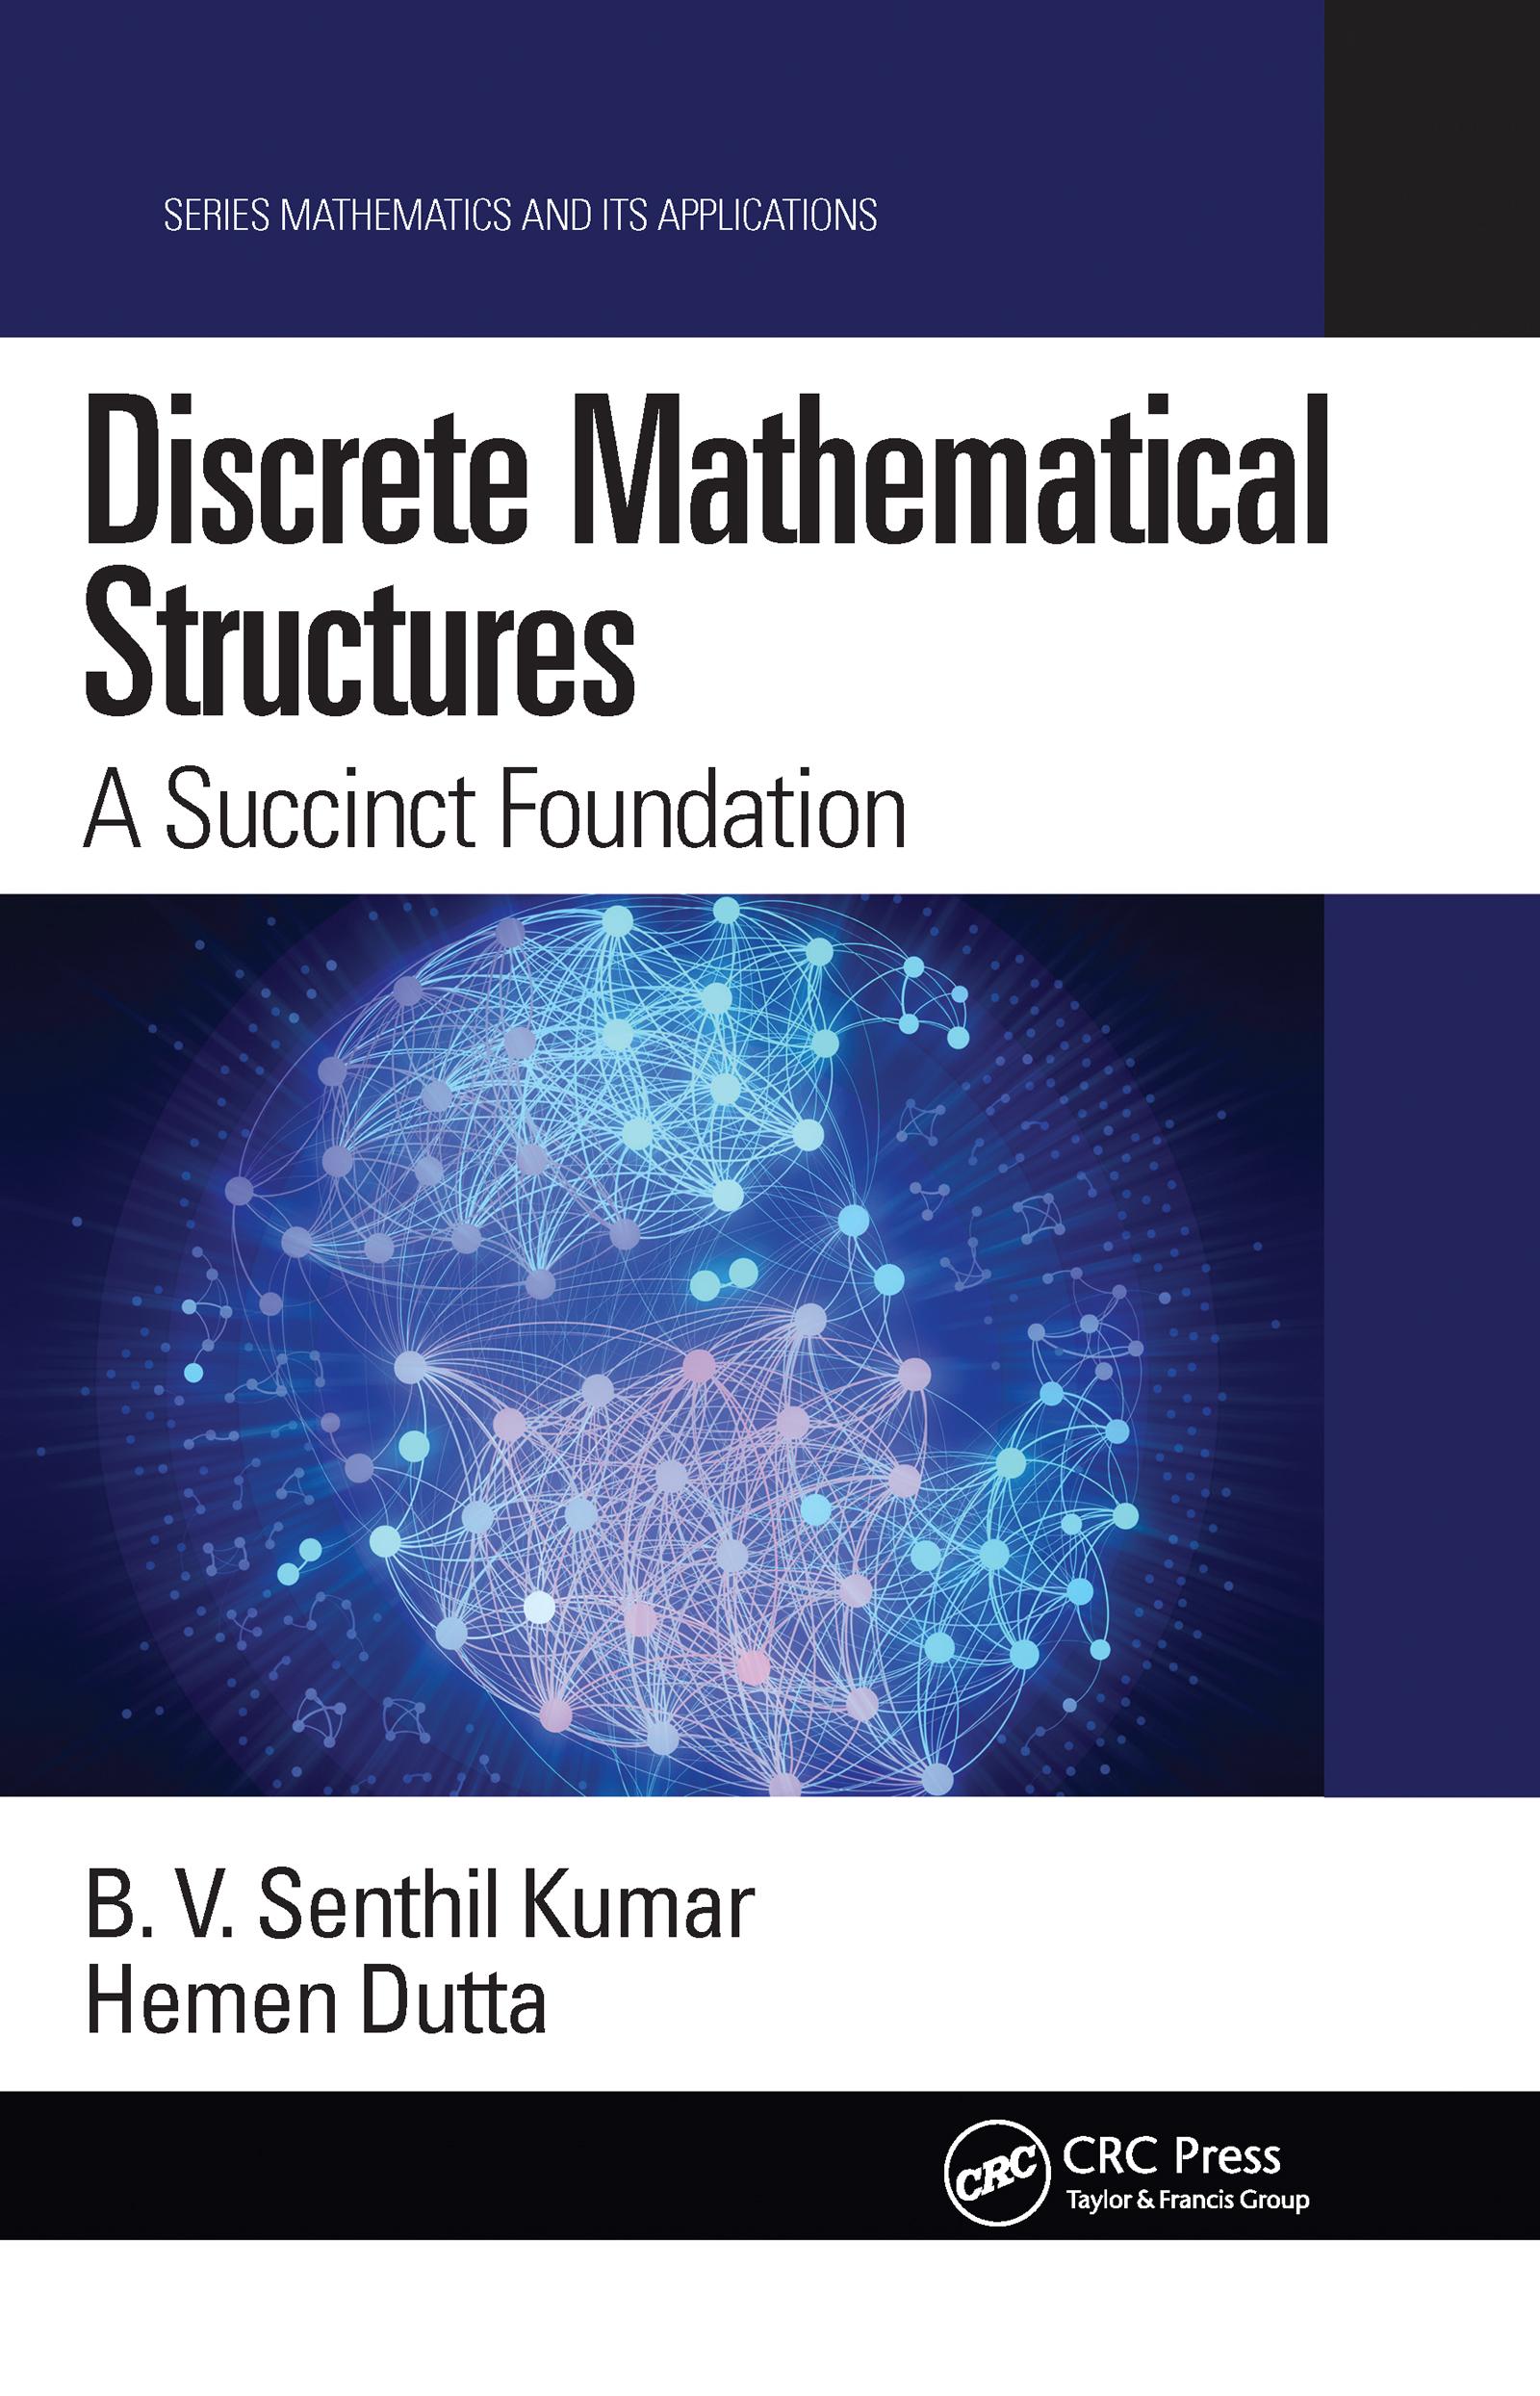 Discrete Mathematical Structures